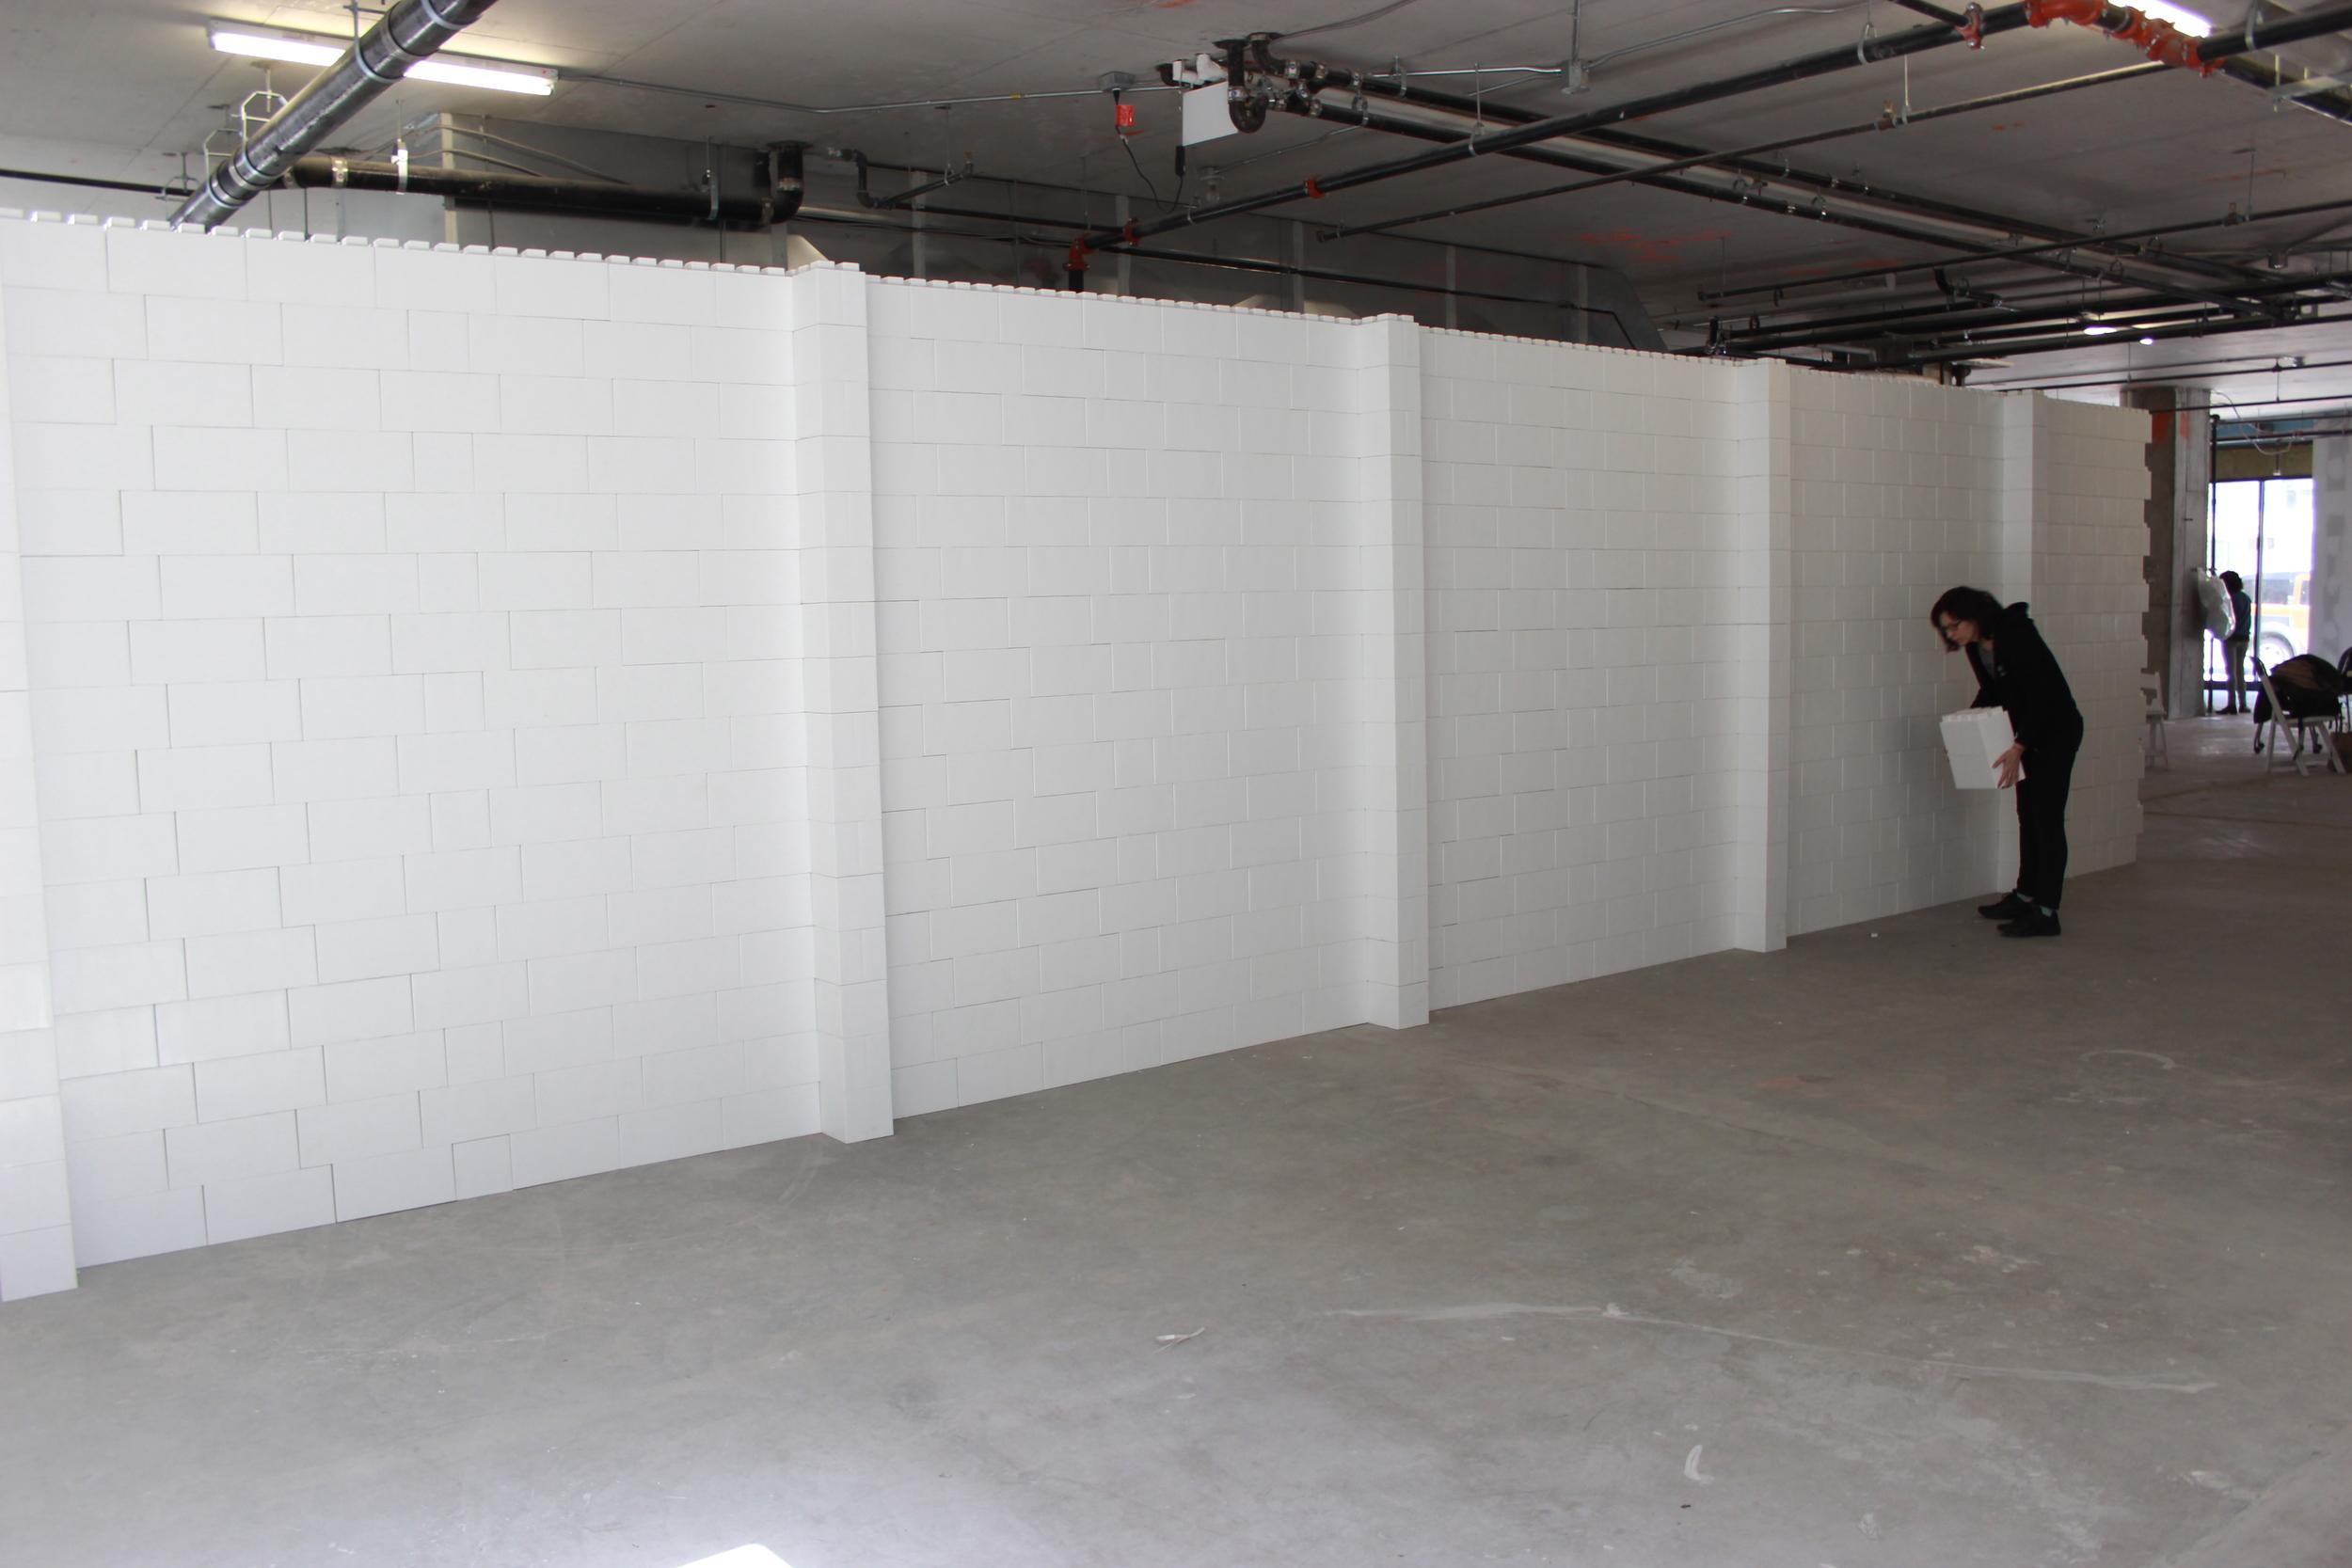 Modular event walls